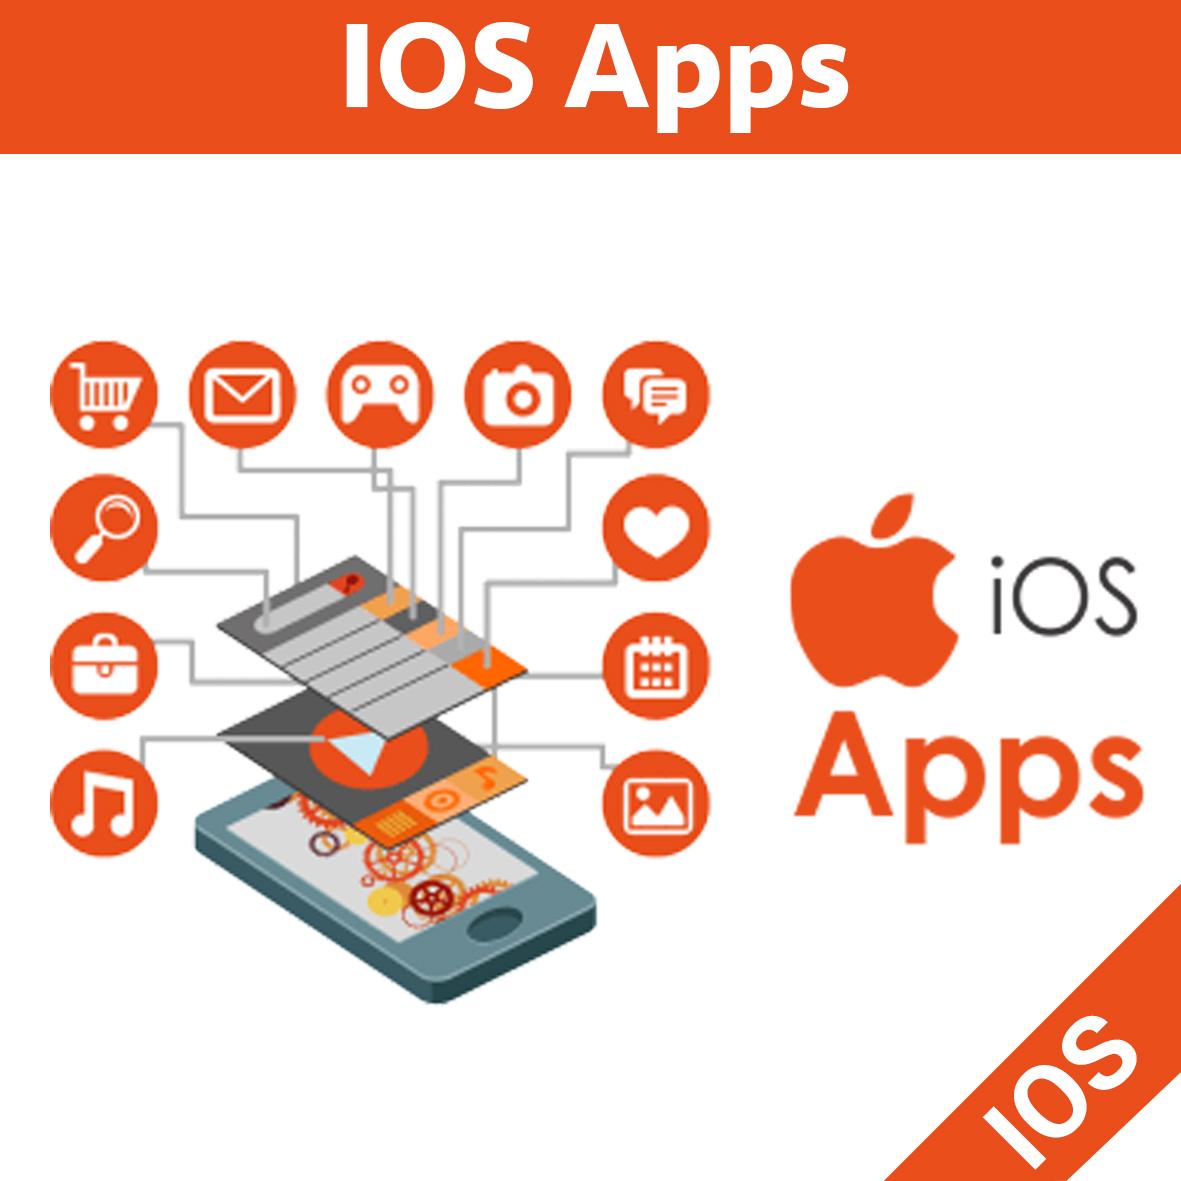 7 aplicaciones iOS de Código Libre Listo Para Usar-CS5020   eBay